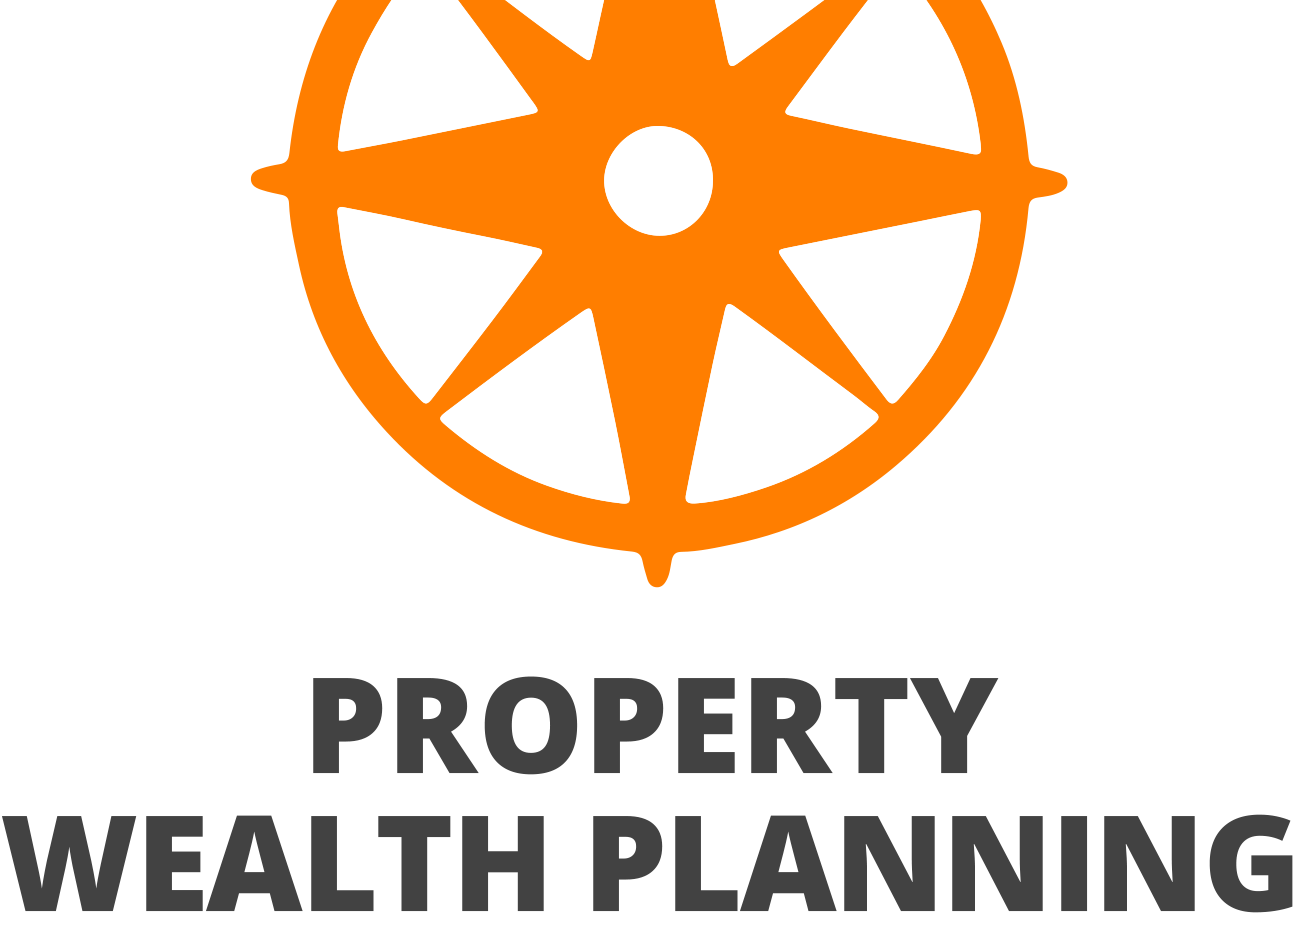 PWP Logo Transparent Background.png